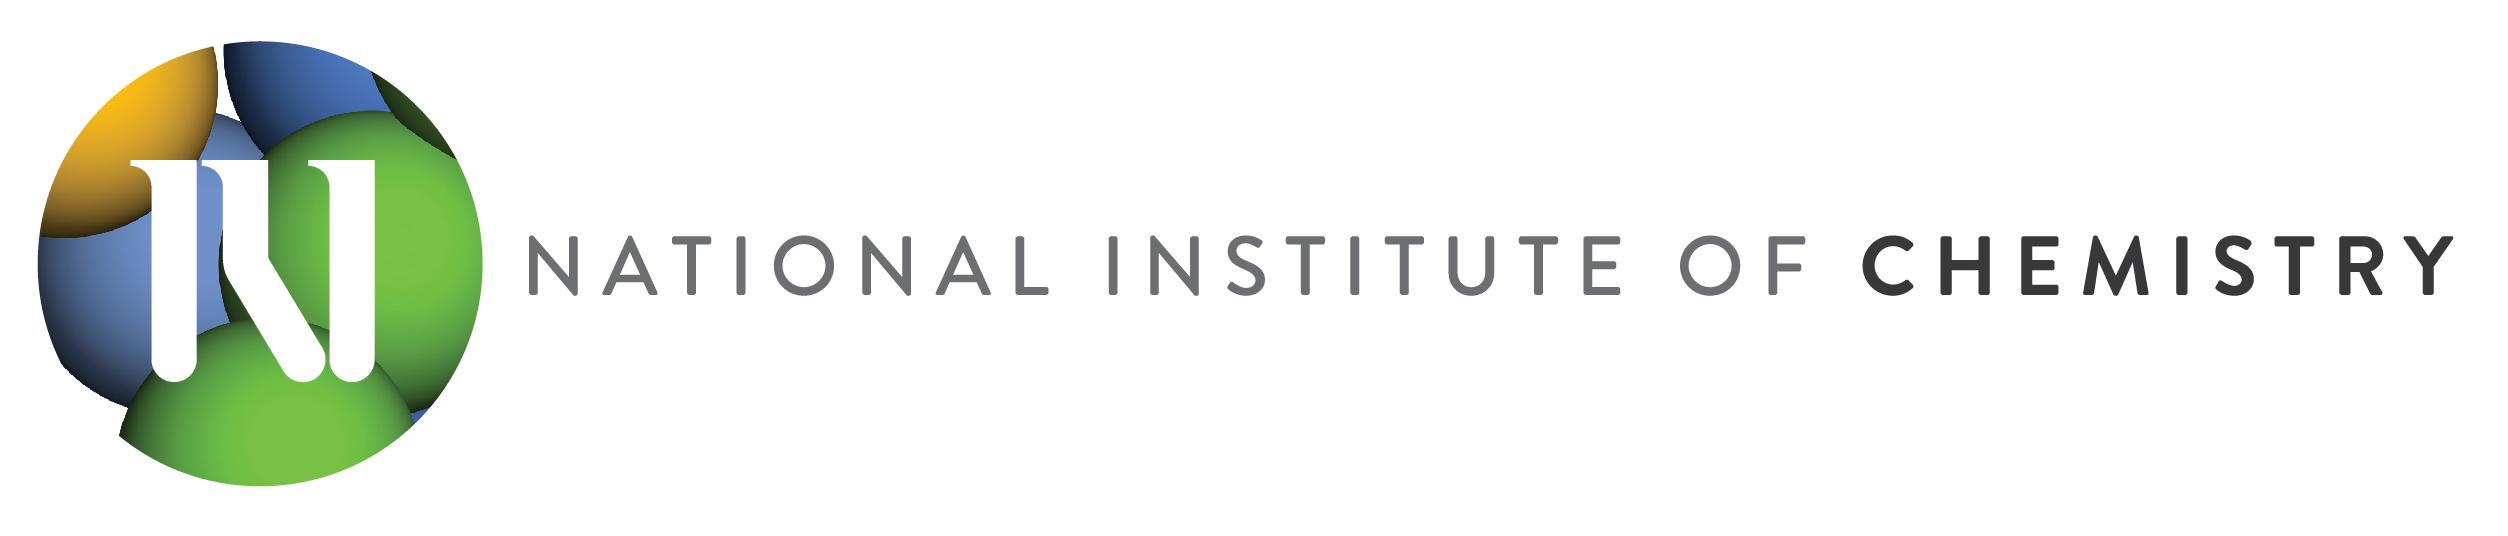 National Institute of Chemistry (KI)